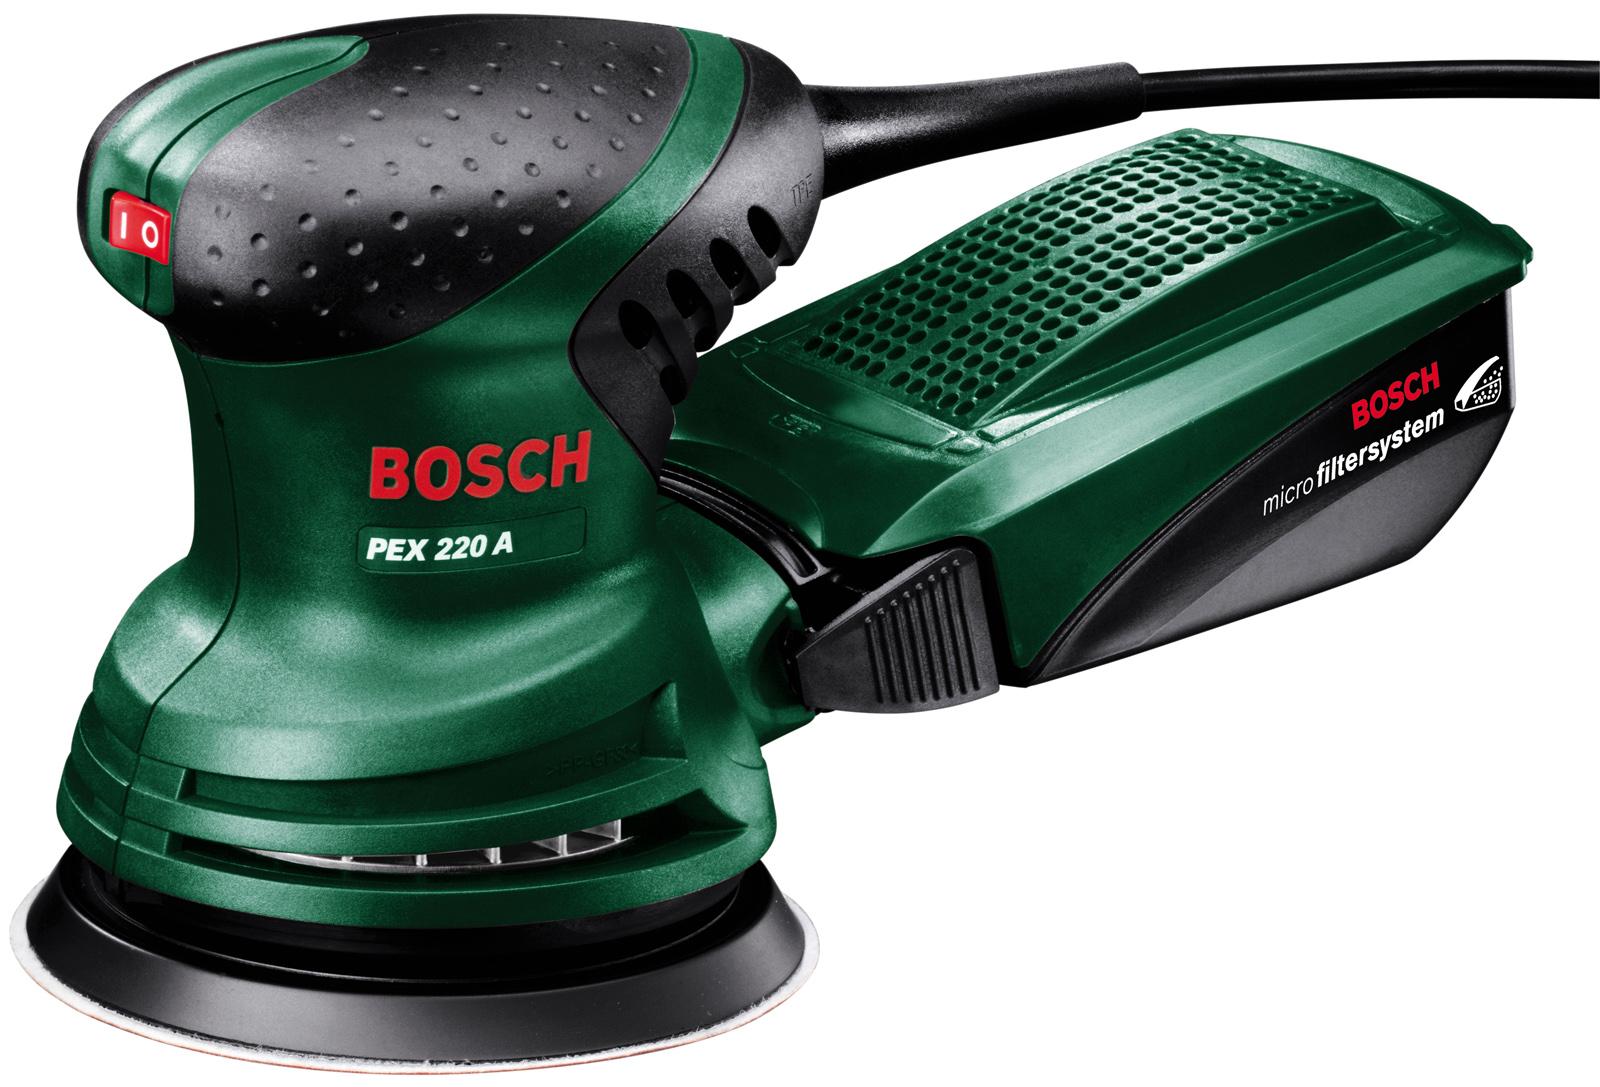 Орбитальная (эксцентриковая) шлифмашина Bosch Pex 220 a